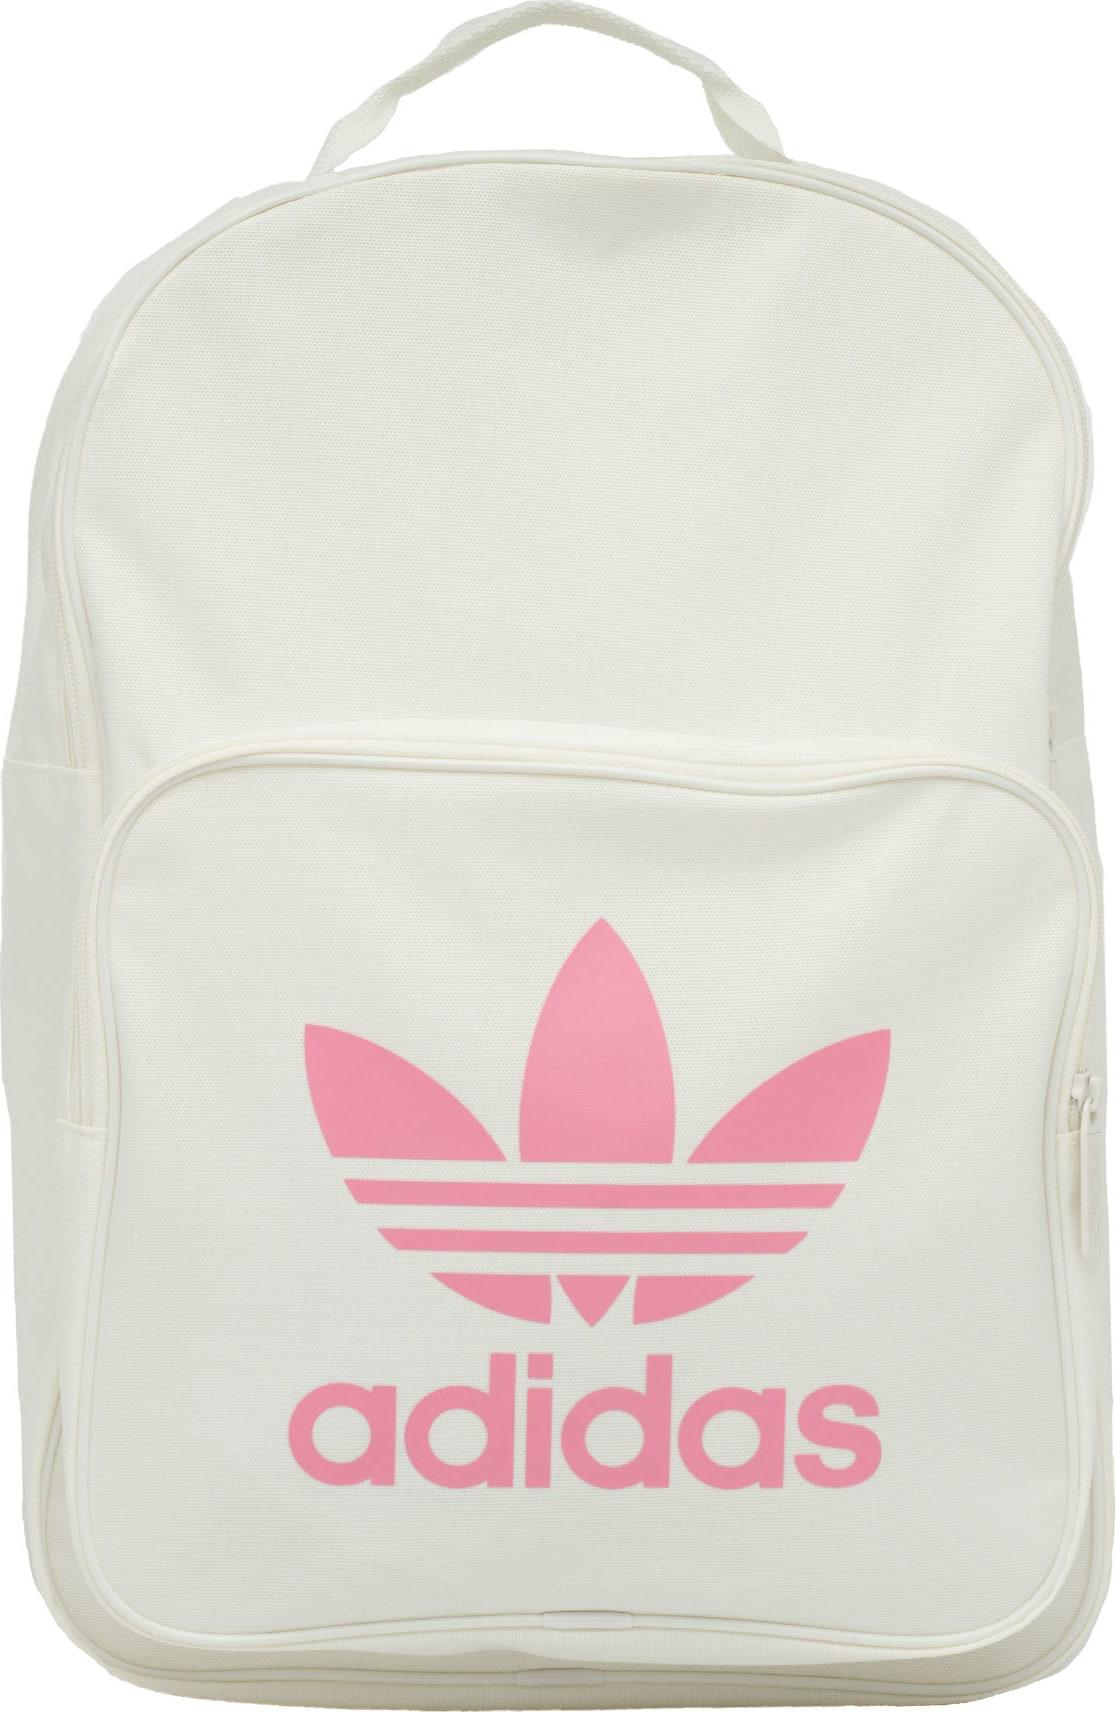 shop unisex adidas originals classic trefoil backpack. Black Bedroom Furniture Sets. Home Design Ideas